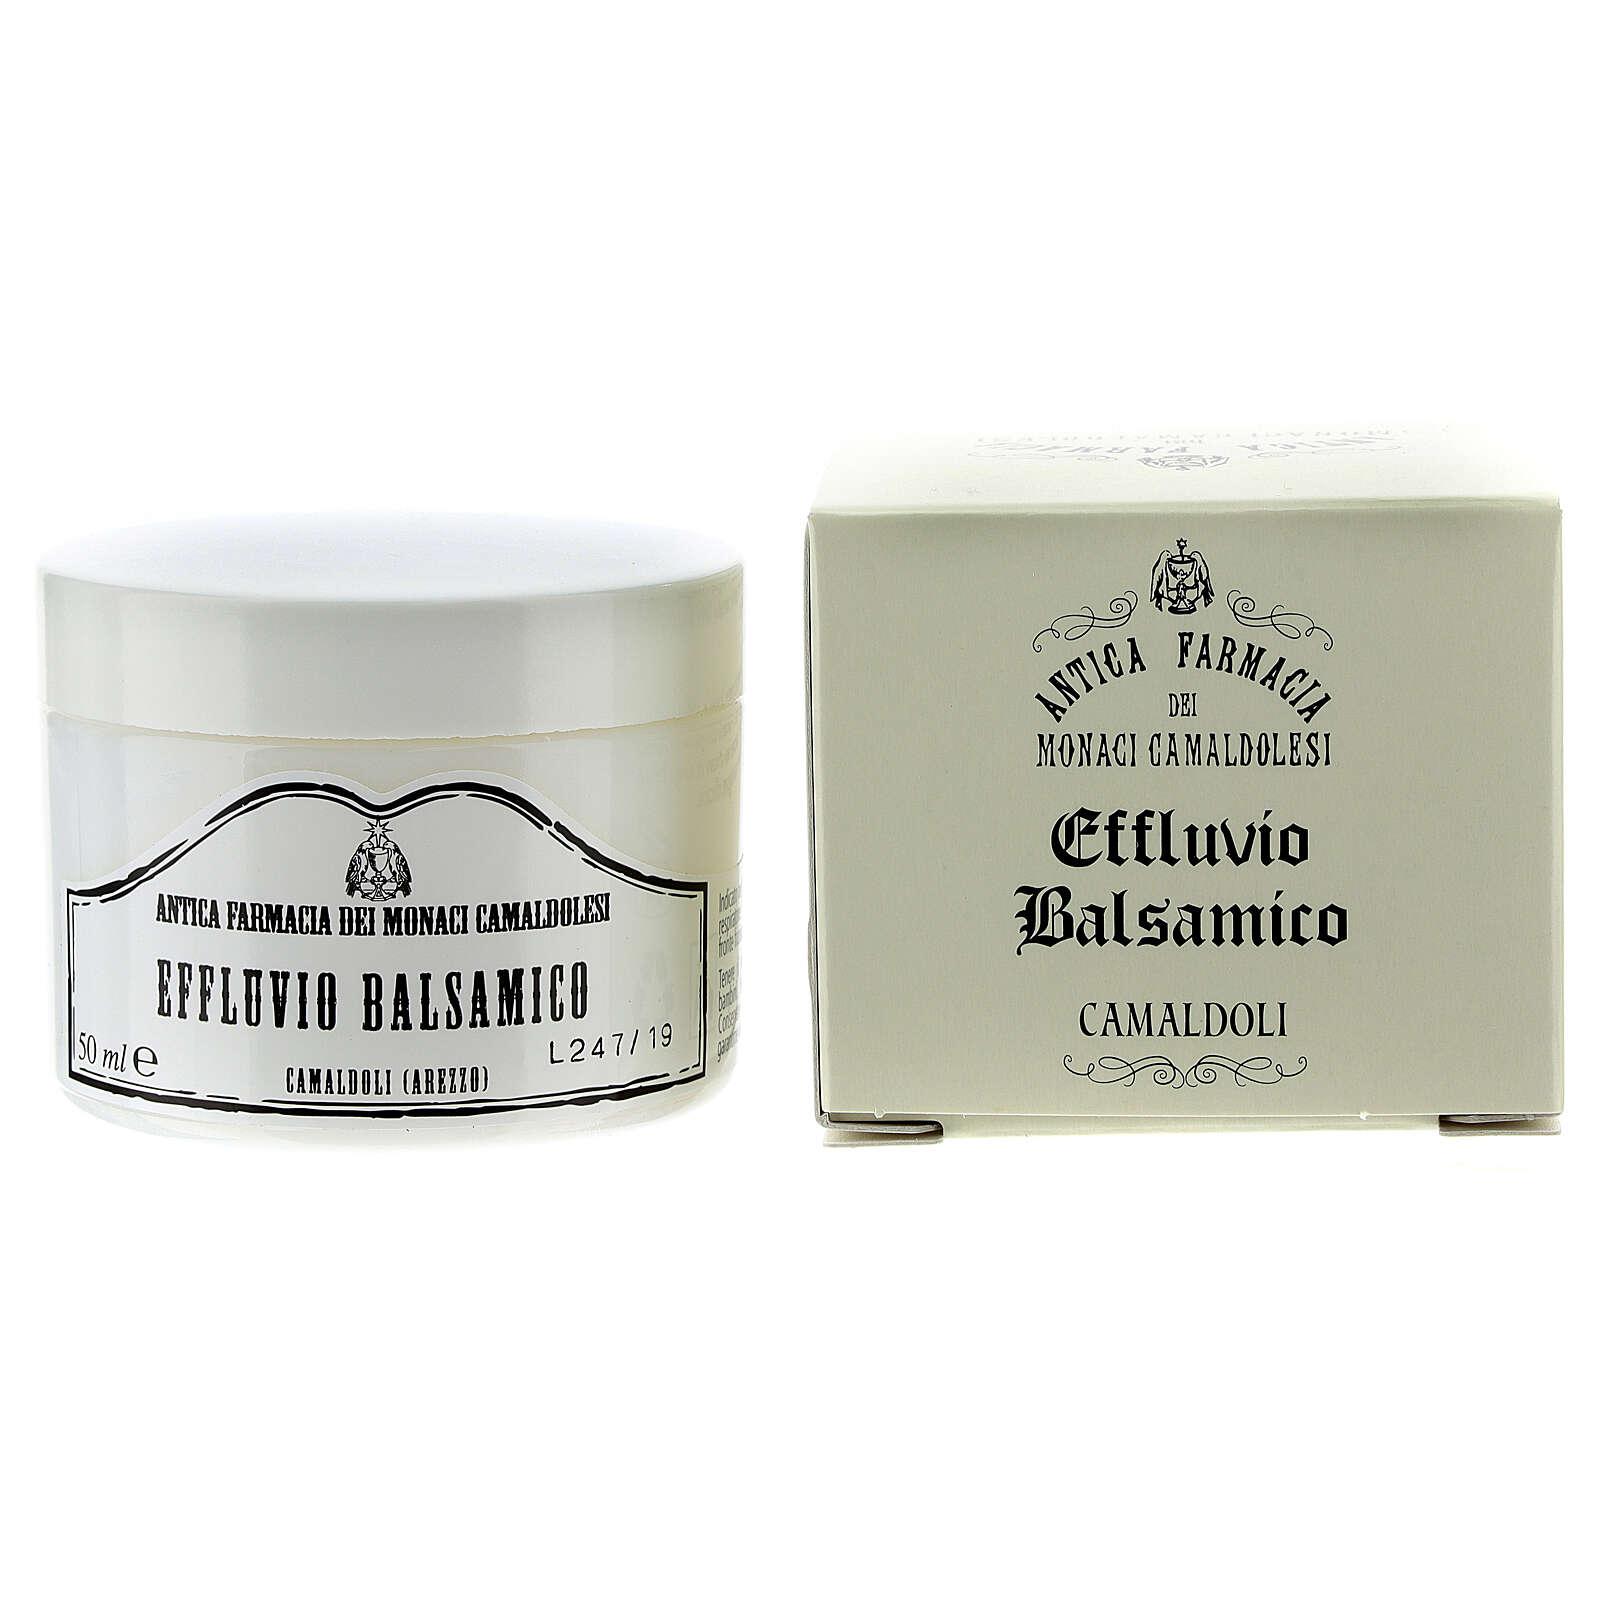 Efluvio Balsámico (30 ml) 4